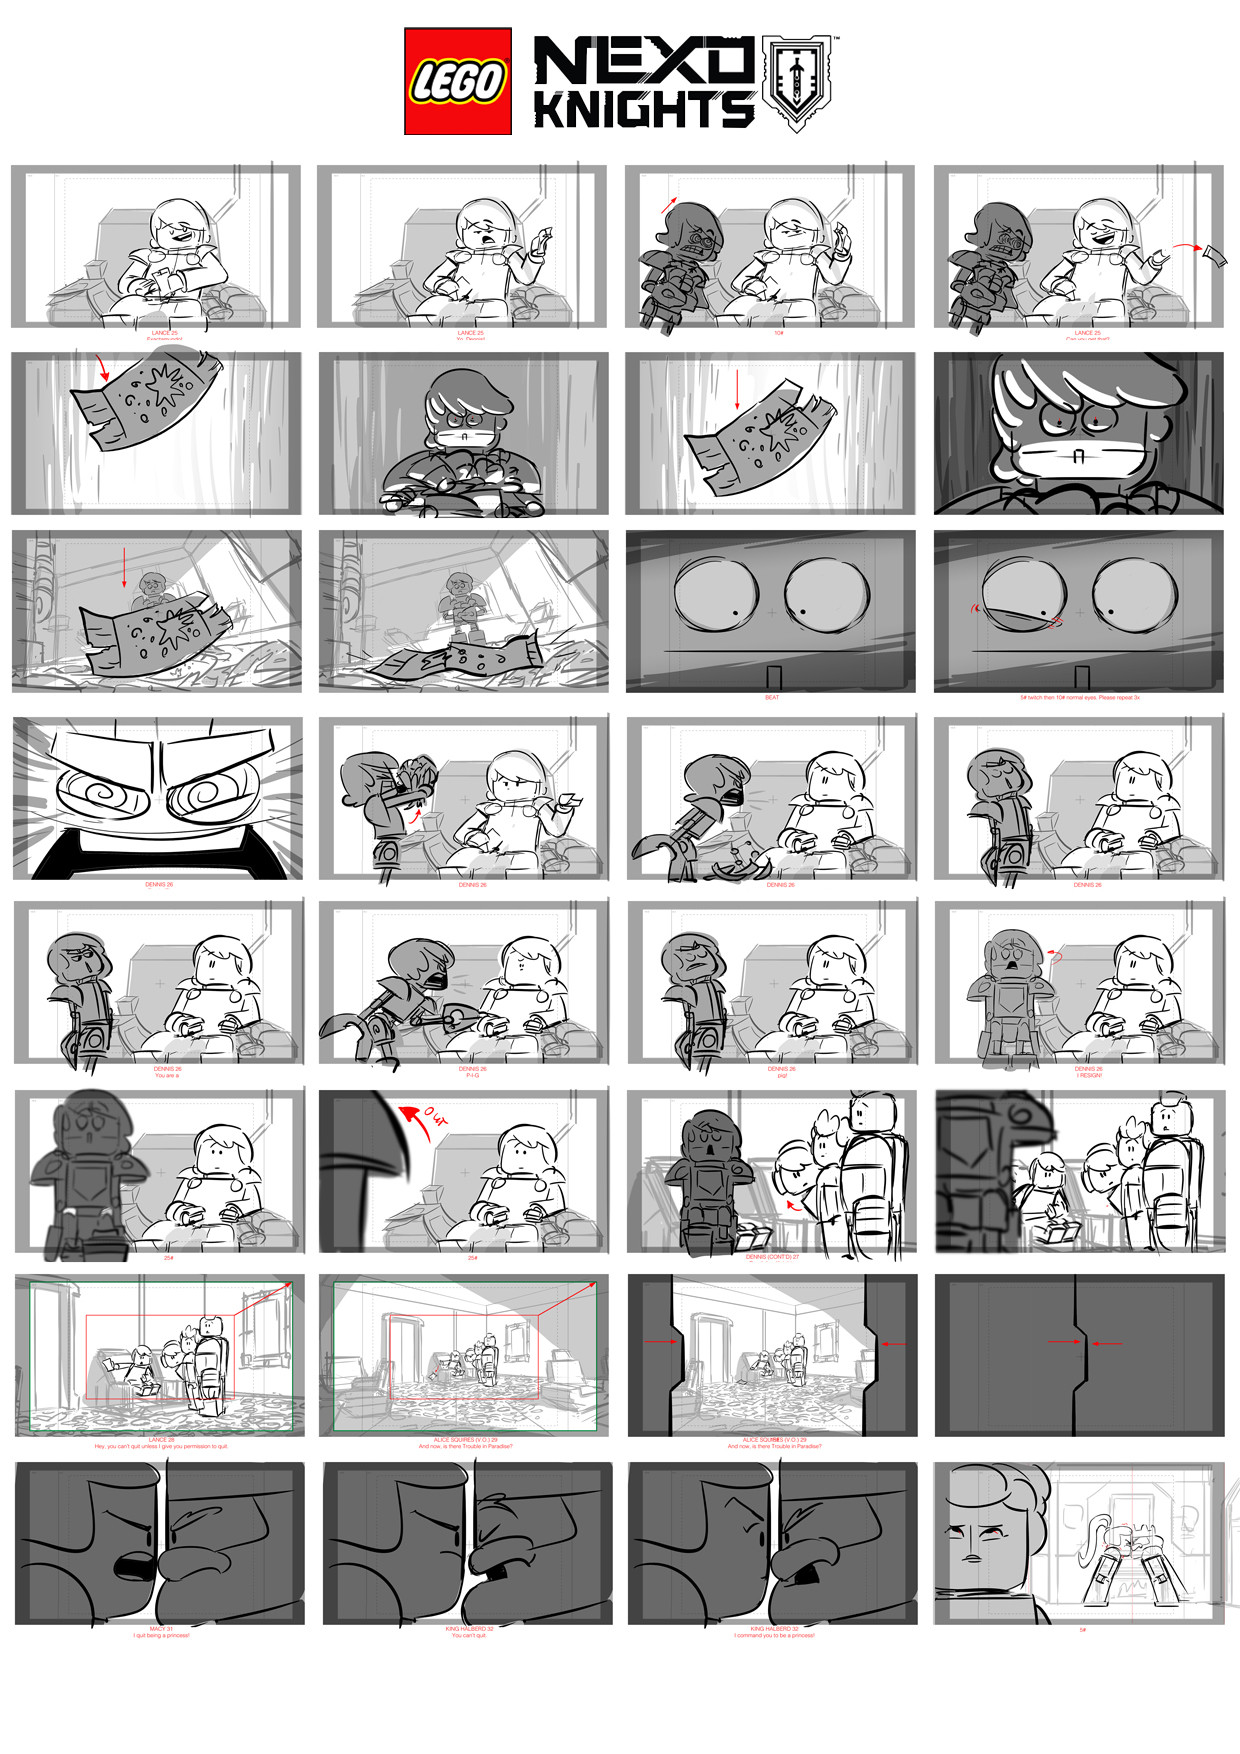 Miklos weigert storyboard page 04b